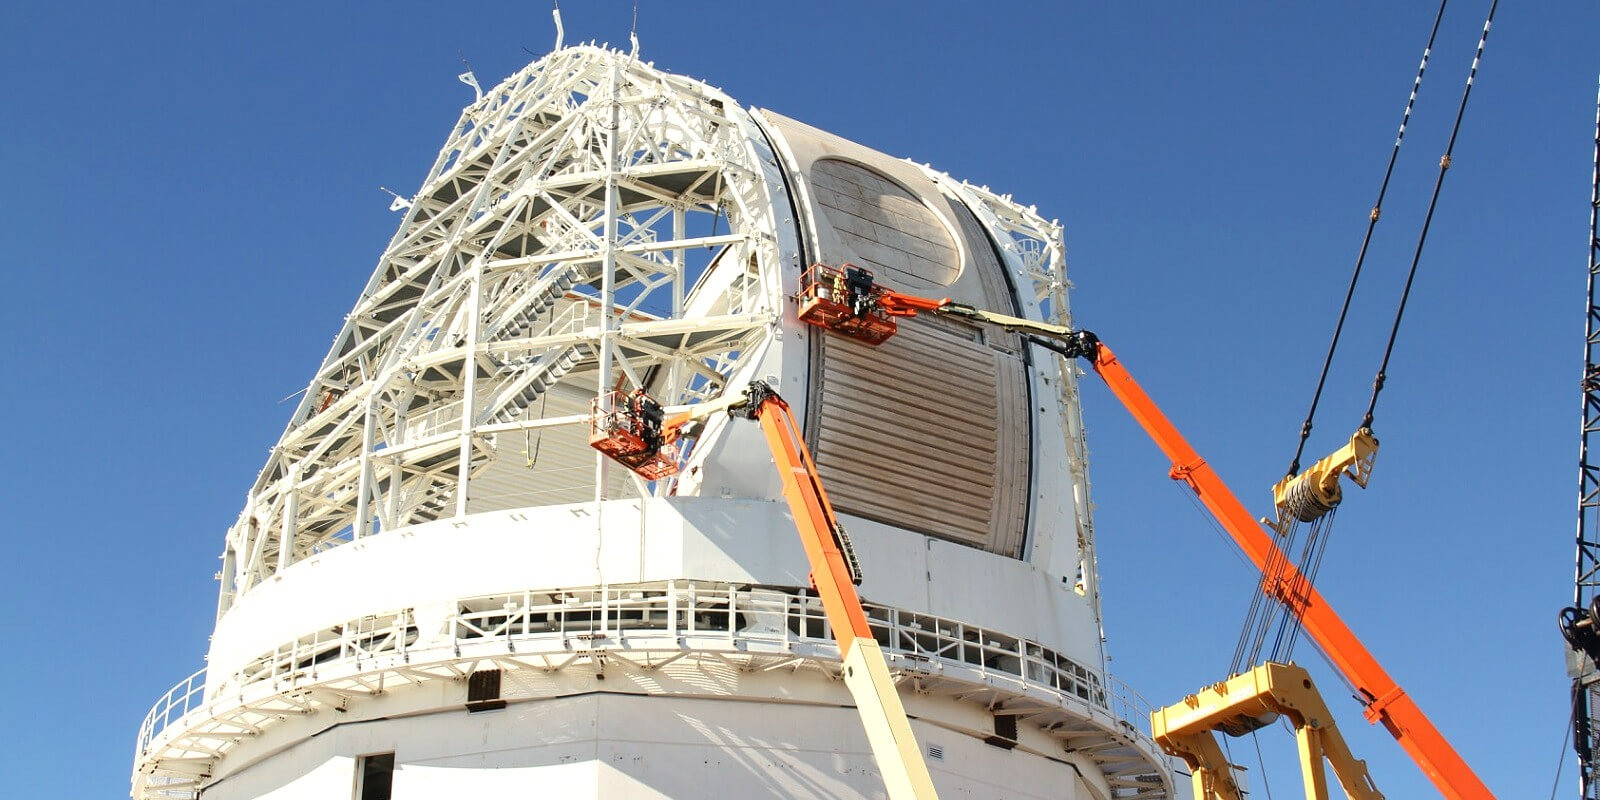 DKIST_Solar_Telescope_ATST_Maui_Hawaii_Idom_ADA_02